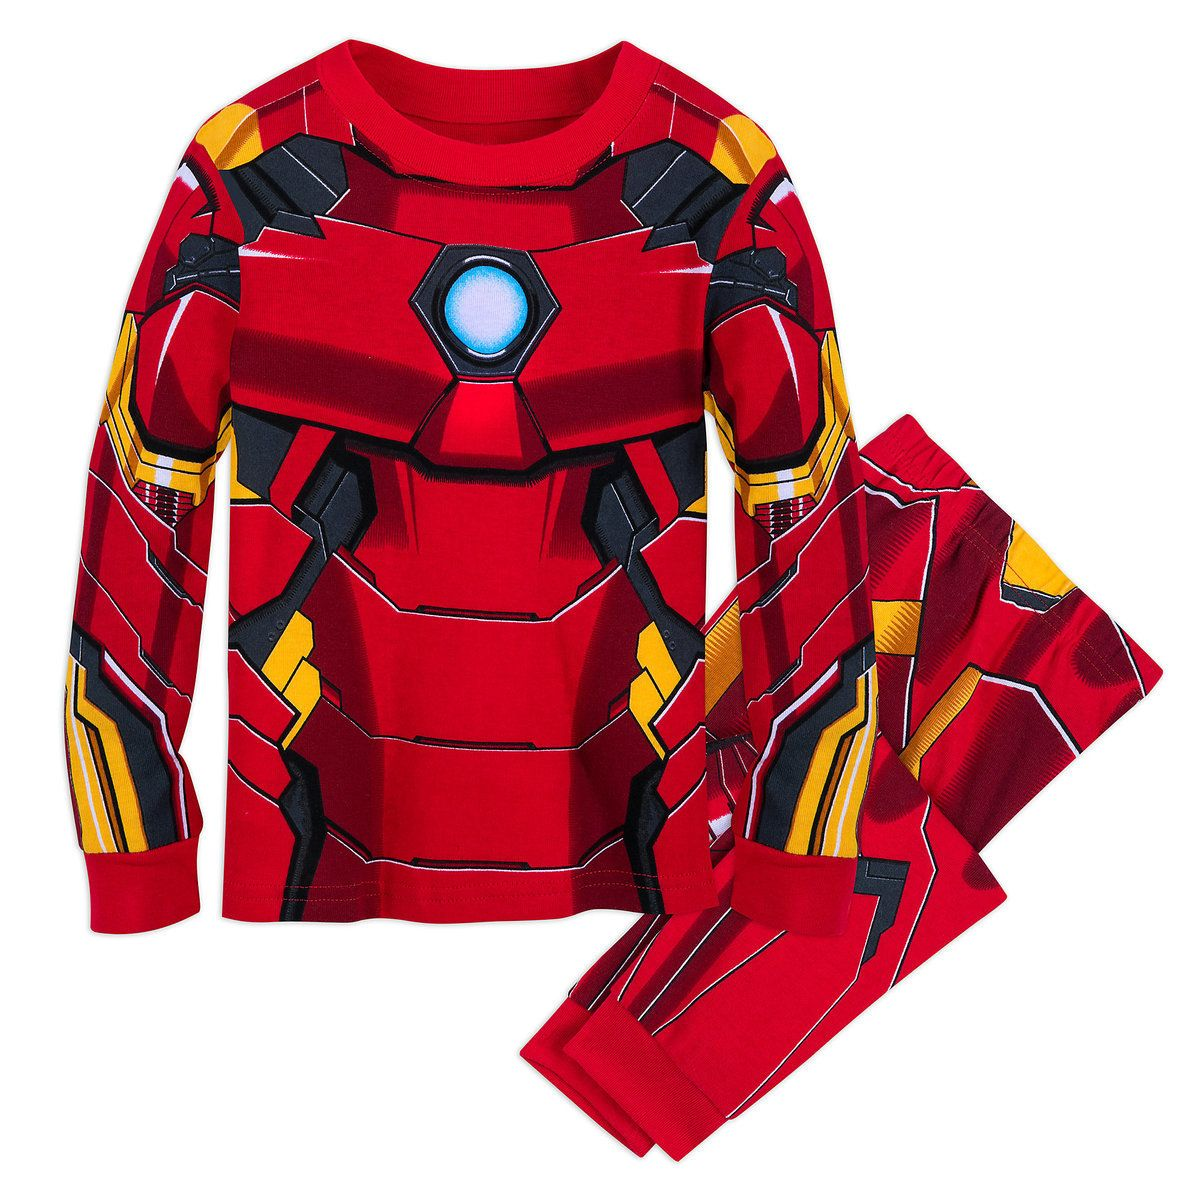 d118dab2d11ef Iron Man Costume PJ PALS for Kids | Boys Clothes | Iron man, Boy ...